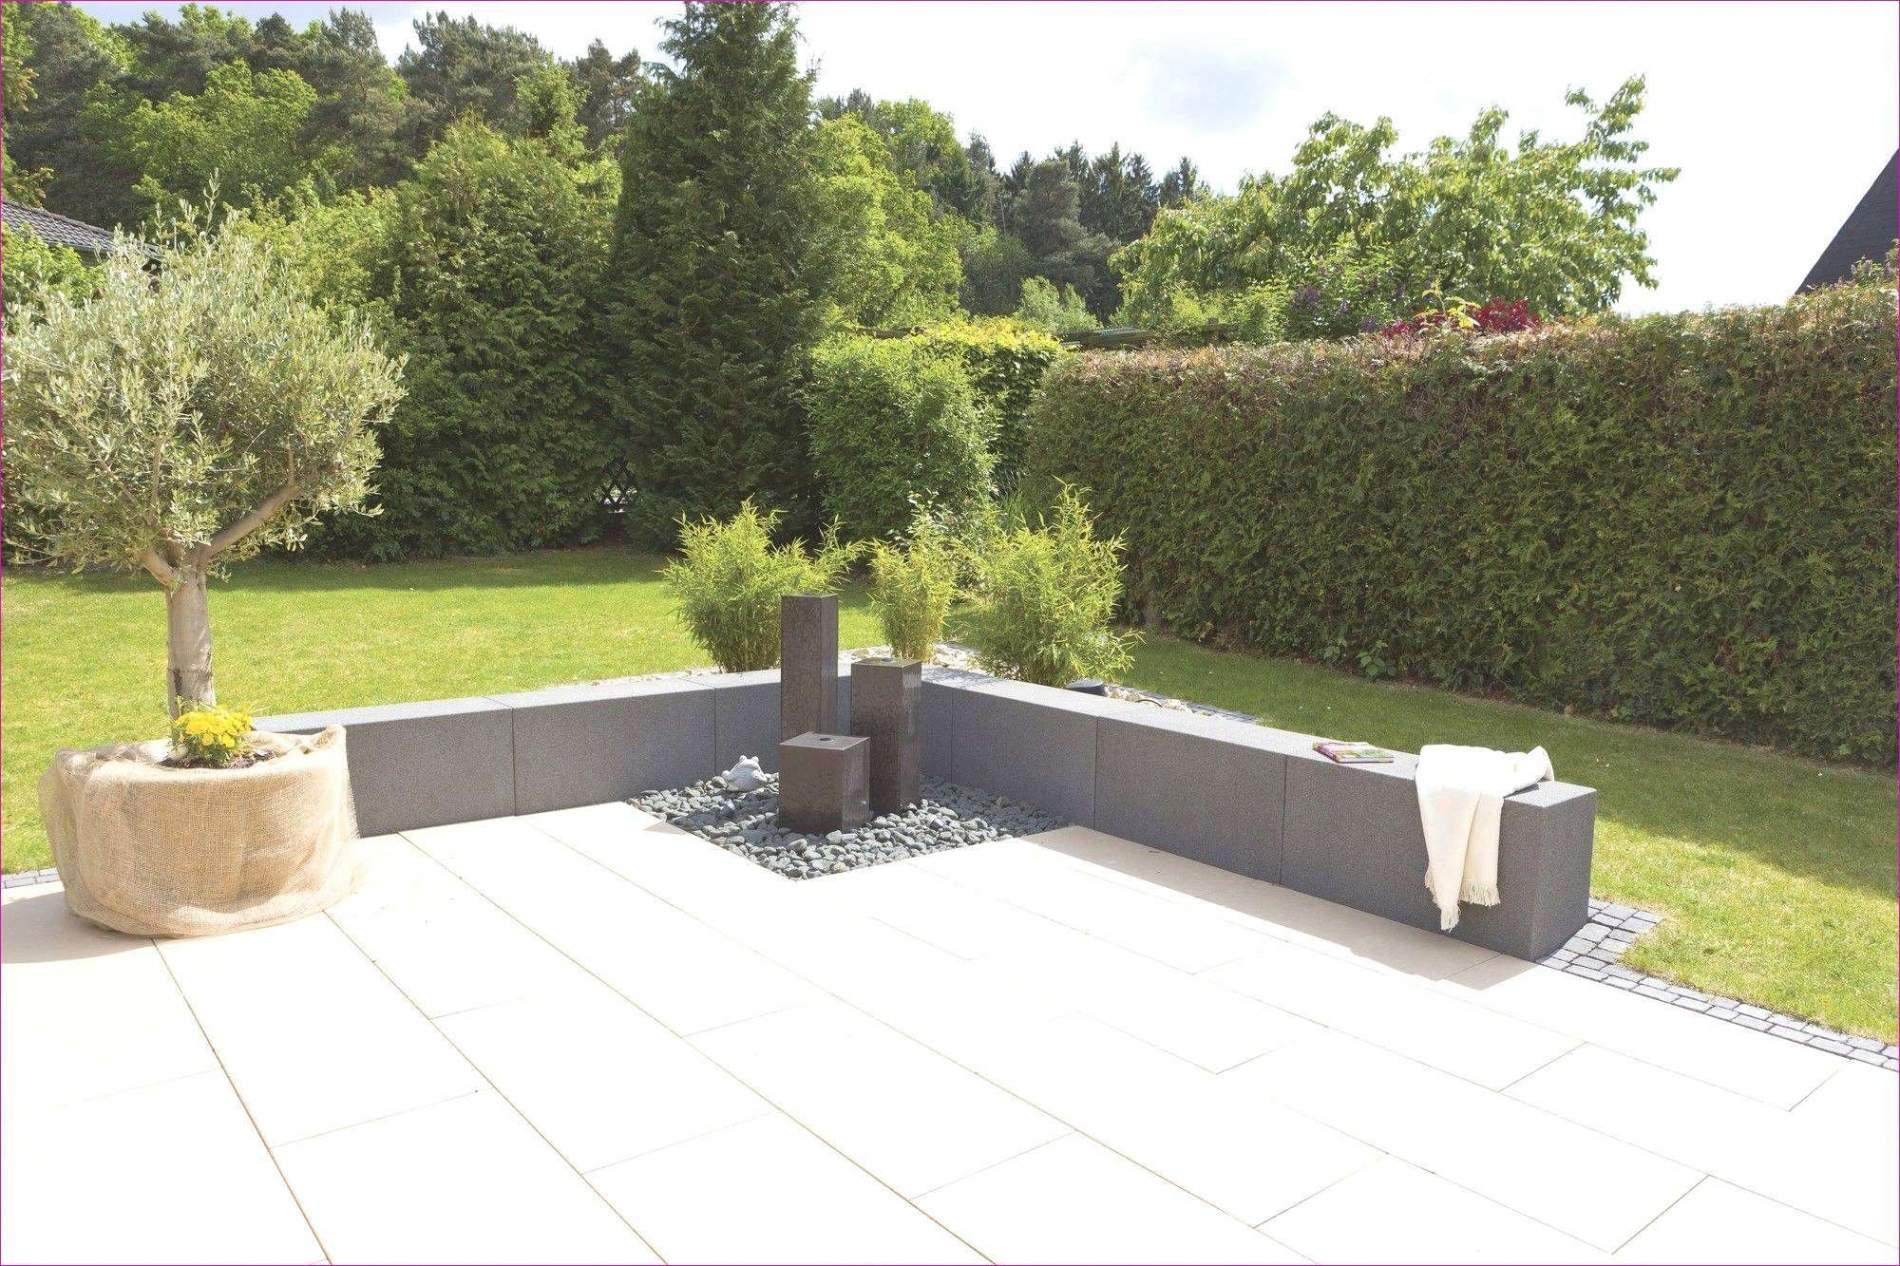 Garten Planen Elegant Alten Garten Neu Anlegen — Temobardz Home Blog